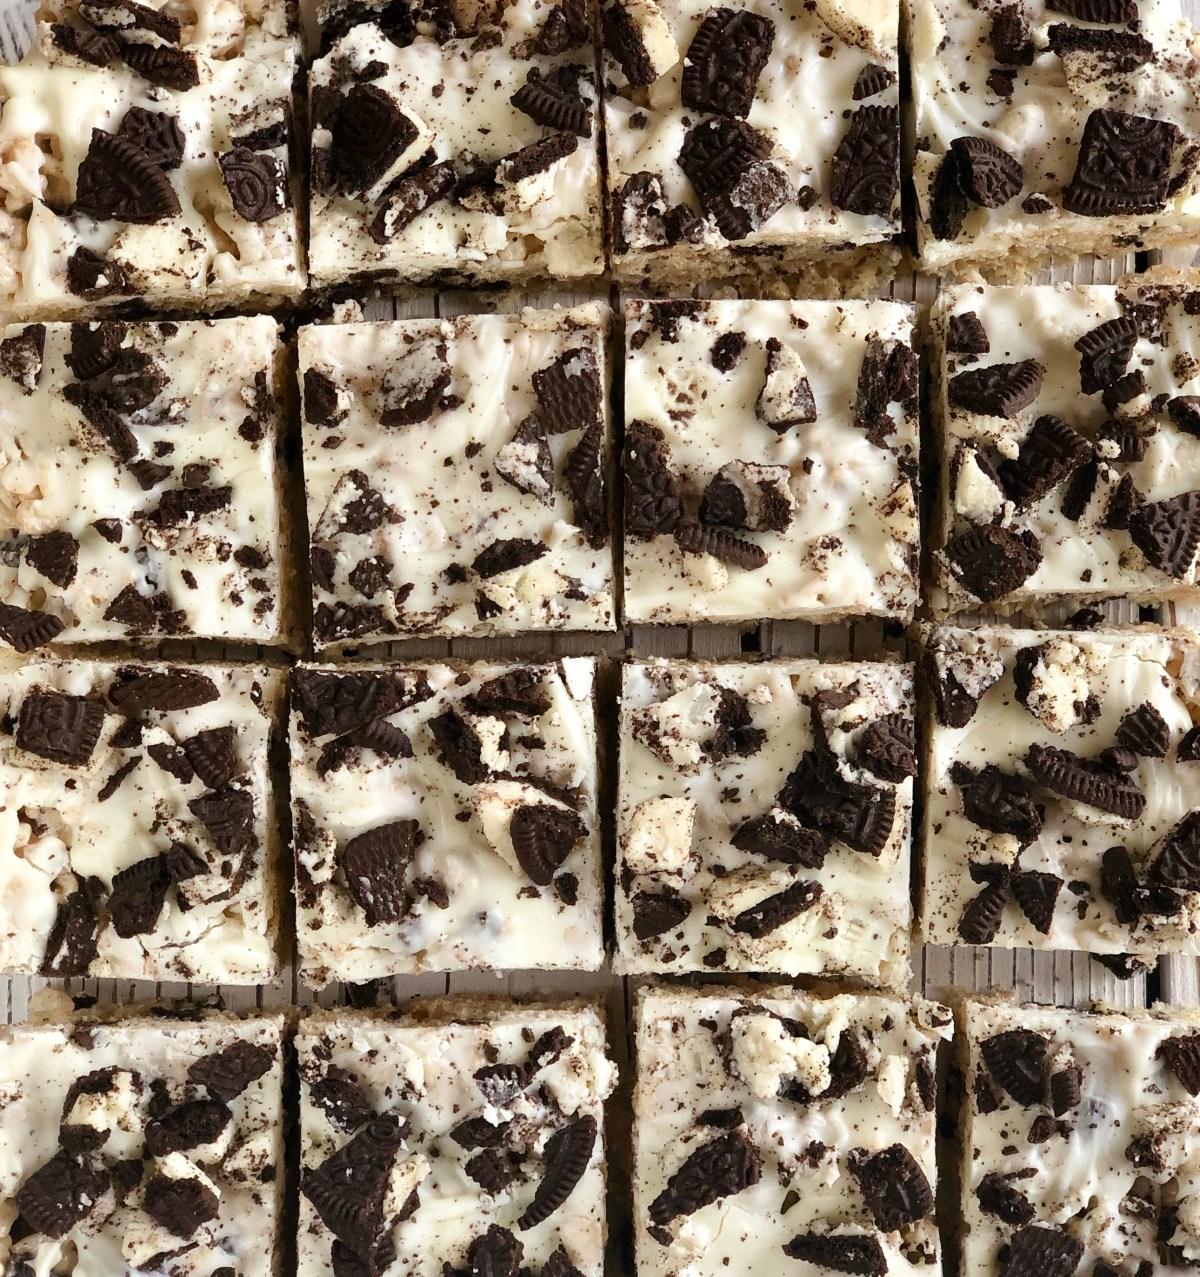 Cookies and Cream Rice Krispies Treats by Happyifeblogspot.com #cookiesandcream #ricekrispietreats #oreoricekrispietreats #dessert #summerdessert #bakesale #nobakedessert